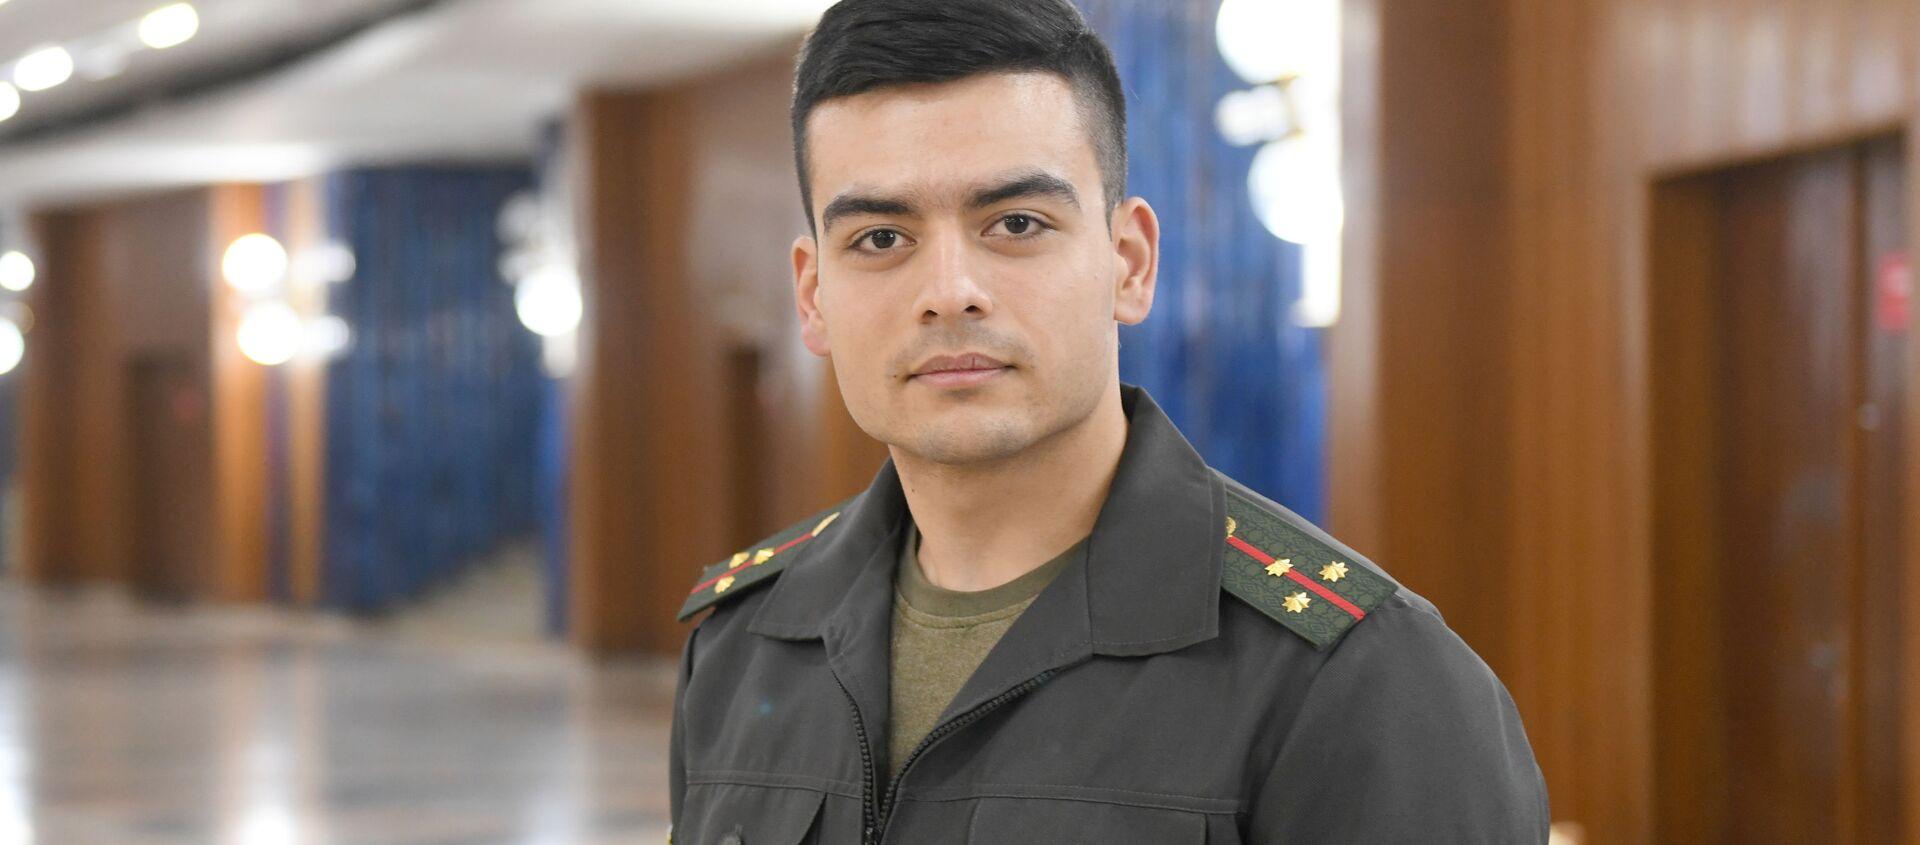 Капитан команды КВН Крупный калибр старший лейтенант Ахат Исмаилов - Sputnik Узбекистан, 1920, 14.01.2021